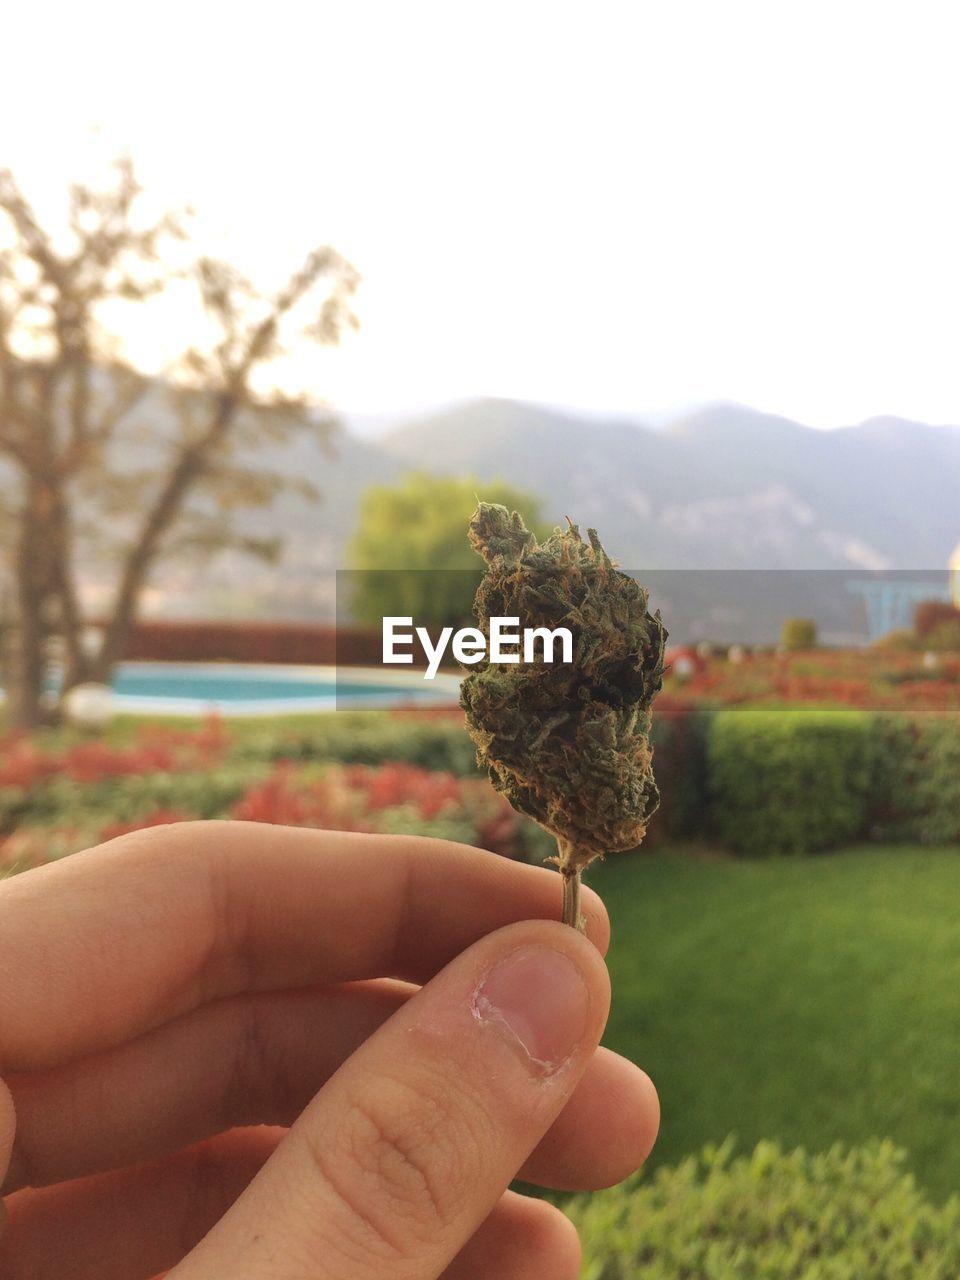 Close-Up Of Hand Holding Marijuana In Park